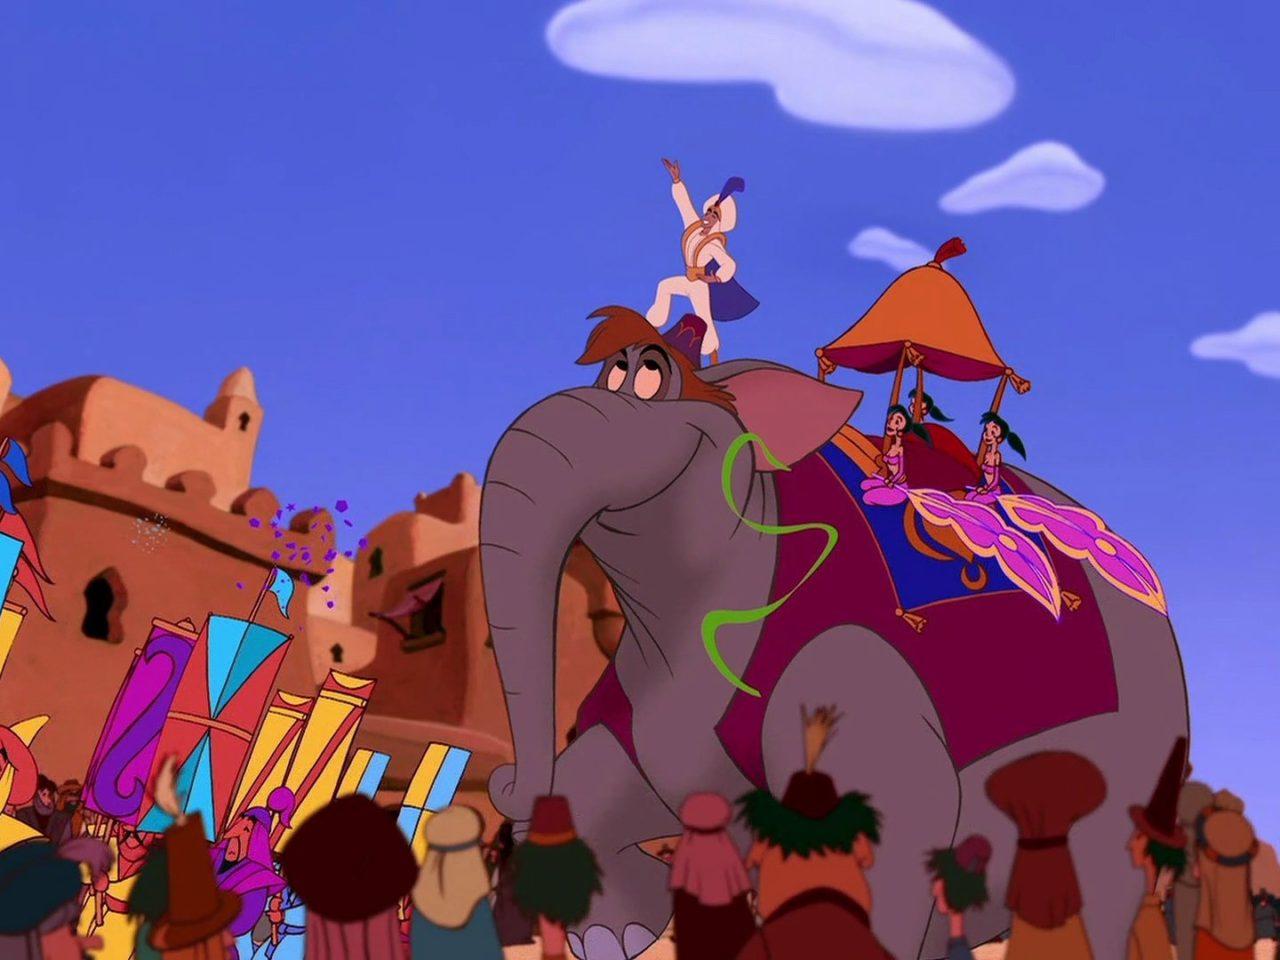 Cars The Movie Christmas Wallpaper Aladdin Prince Parade Riding An Elephant Disney Movie